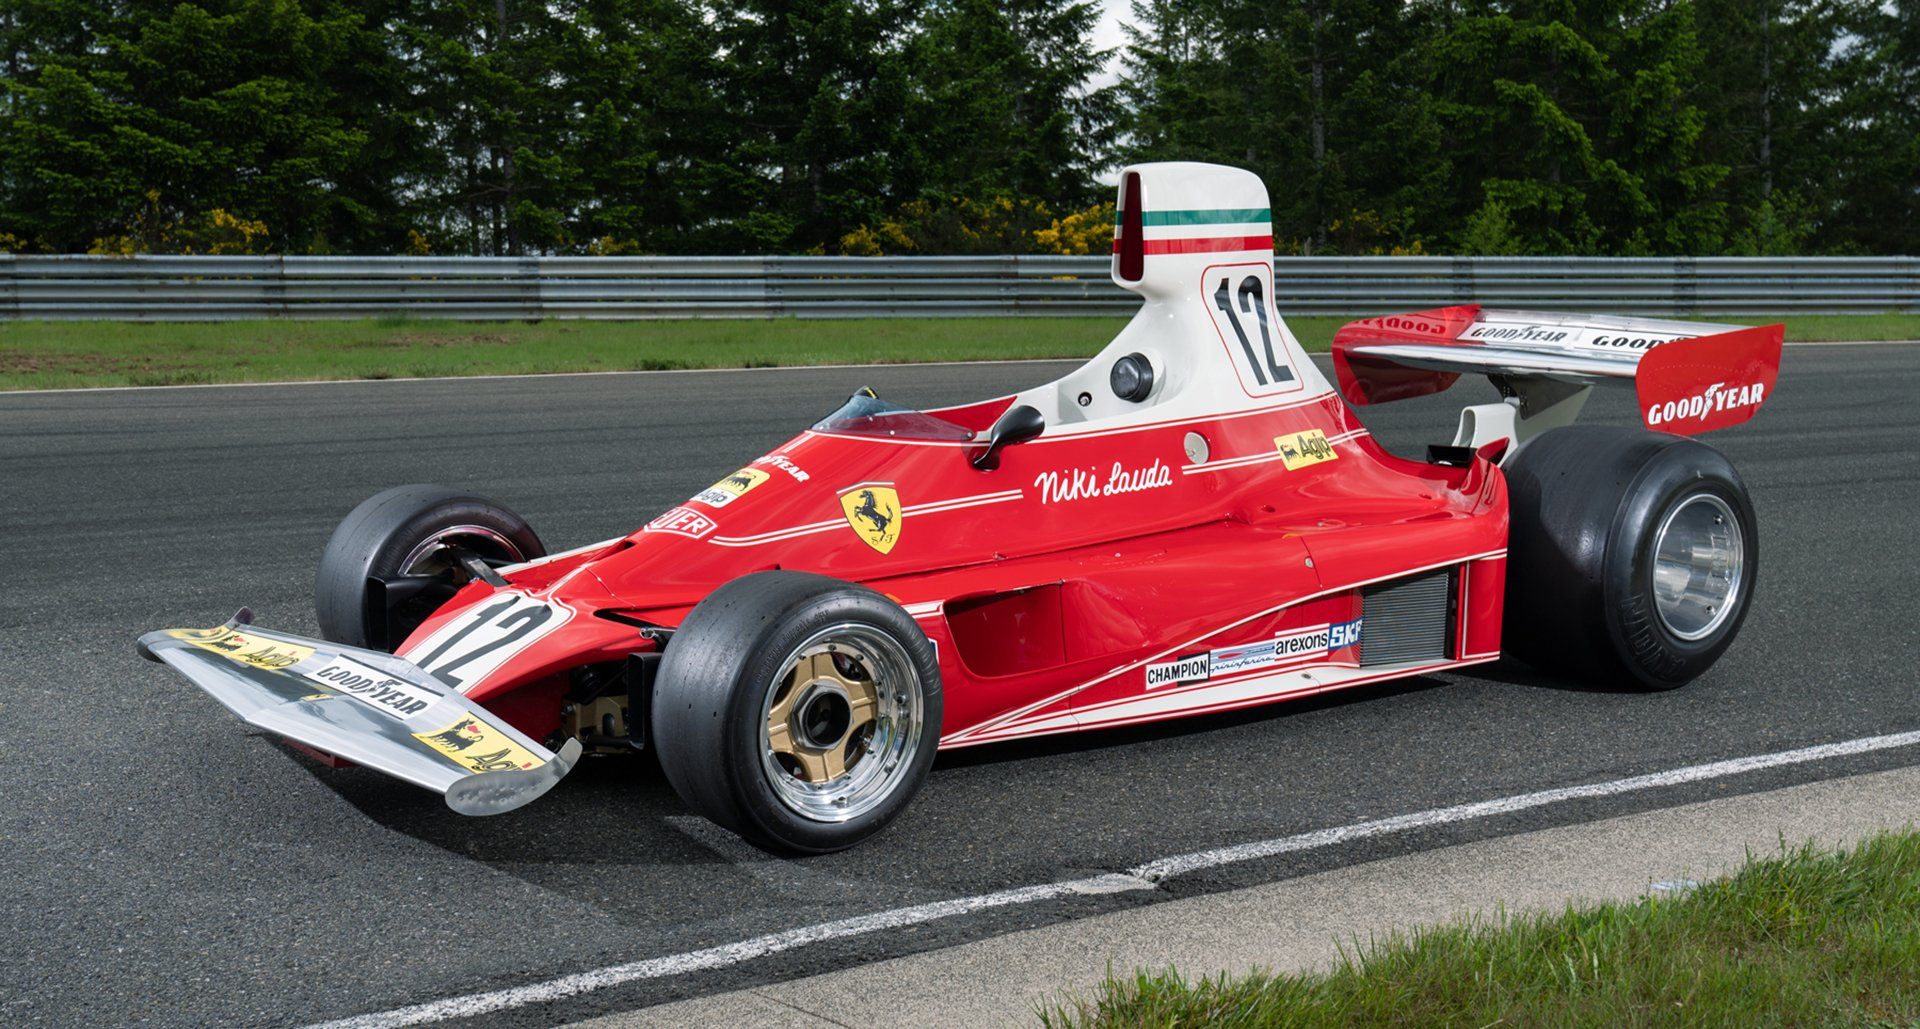 Ferrari F40 For Sale >> The Petrolhaed Corner - The Ferrari Edition - Driving a ...